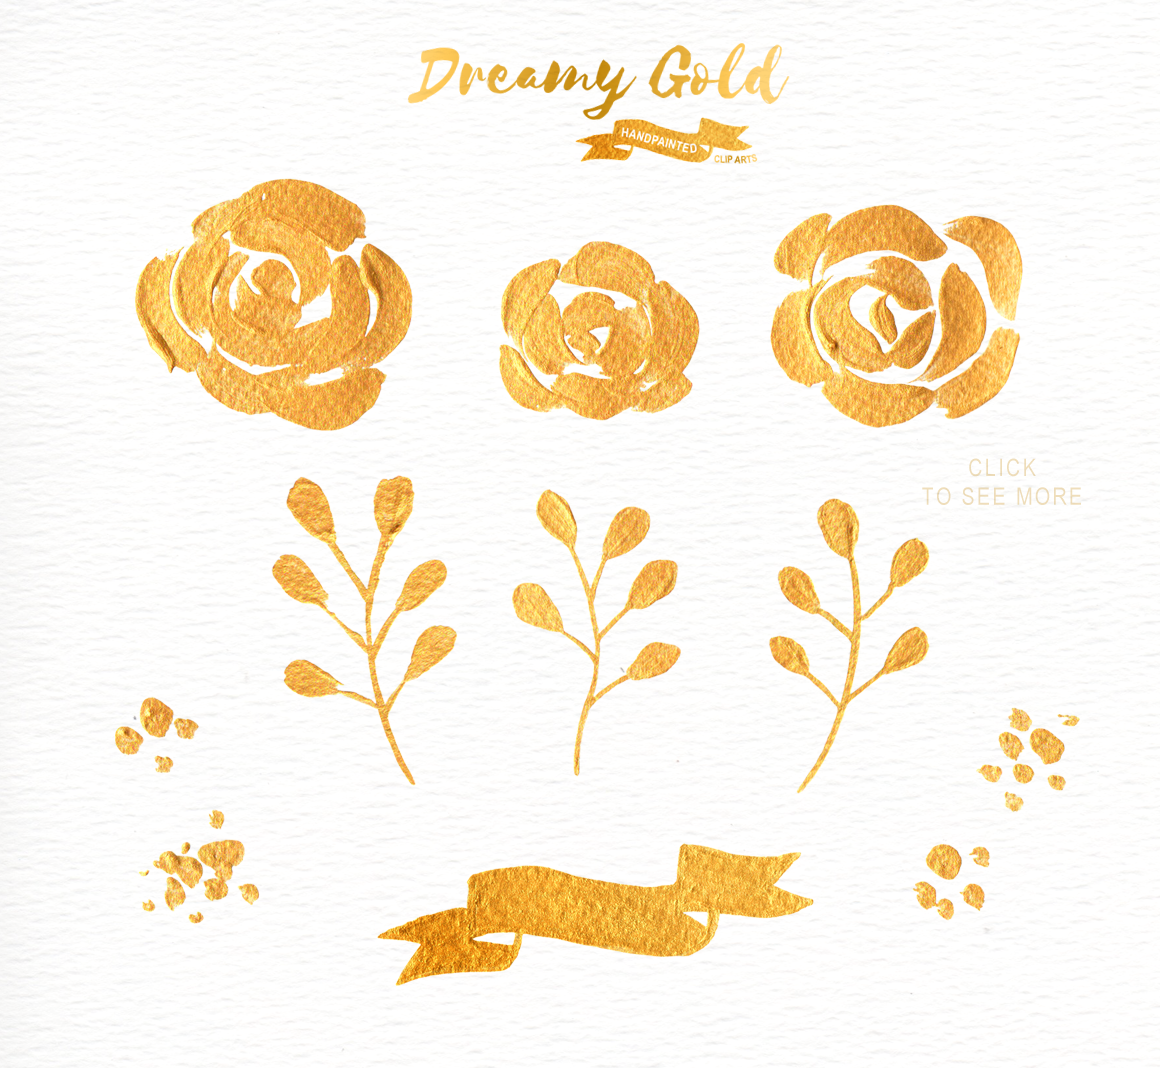 Dreamy Gold Flower Clipart by everysunsun on @creativemarket